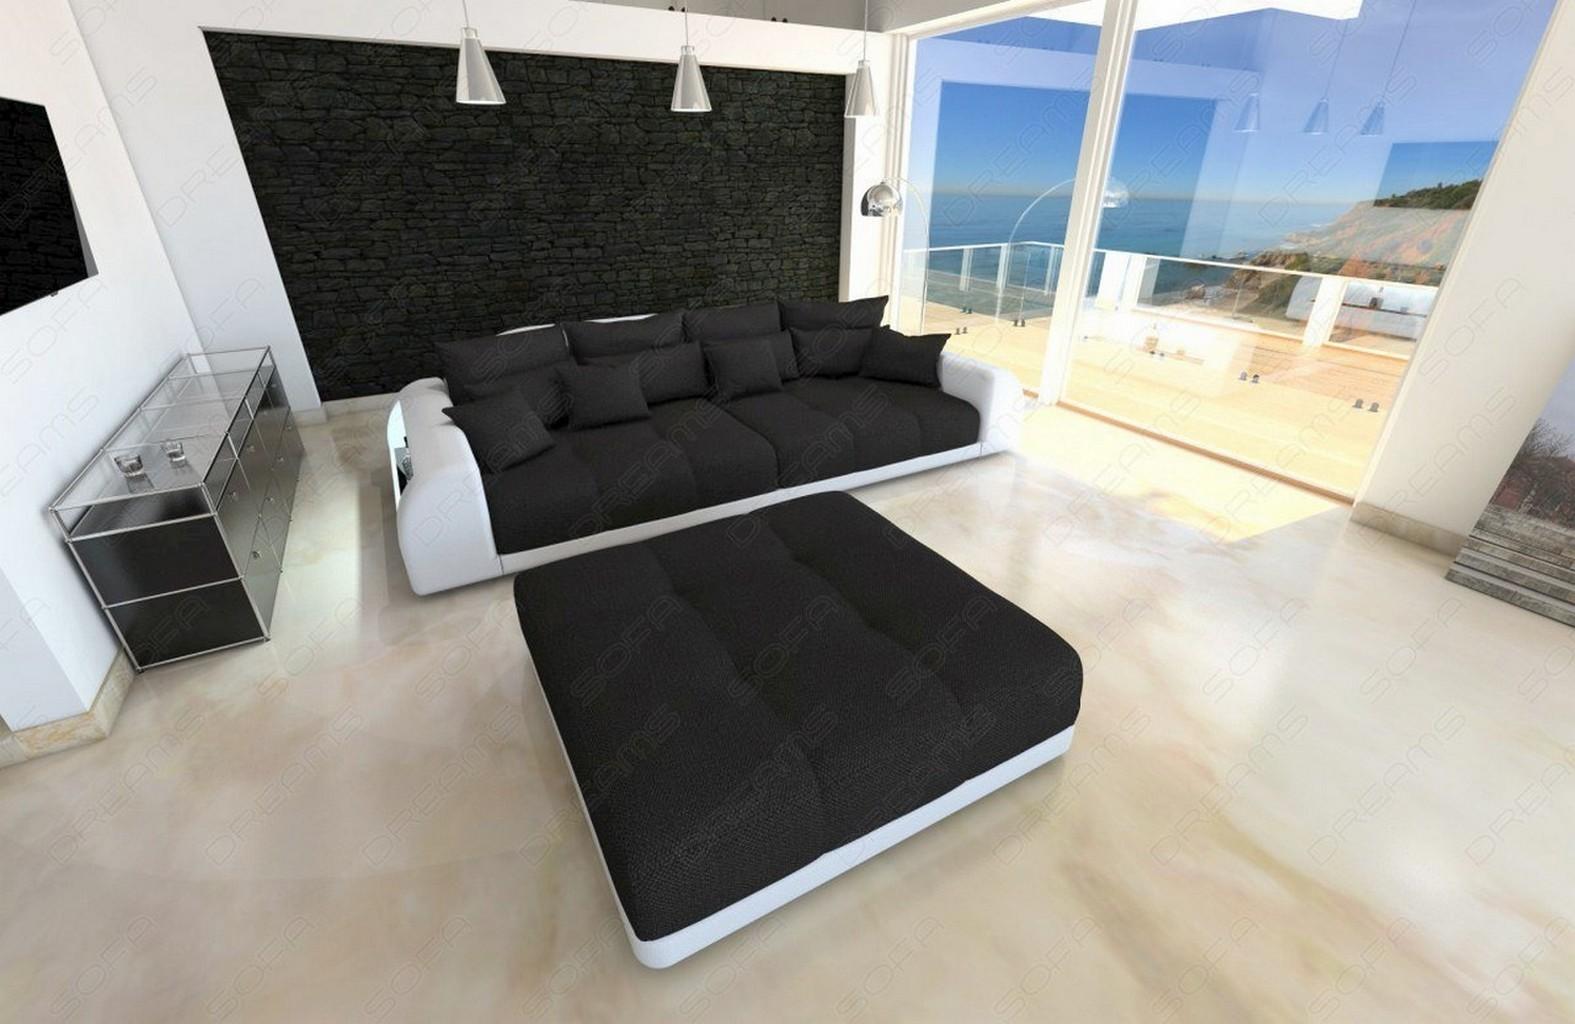 big sofa miami megasofa xxl bigsofa mega stoff couch weiss schwarz lagerware ebay. Black Bedroom Furniture Sets. Home Design Ideas